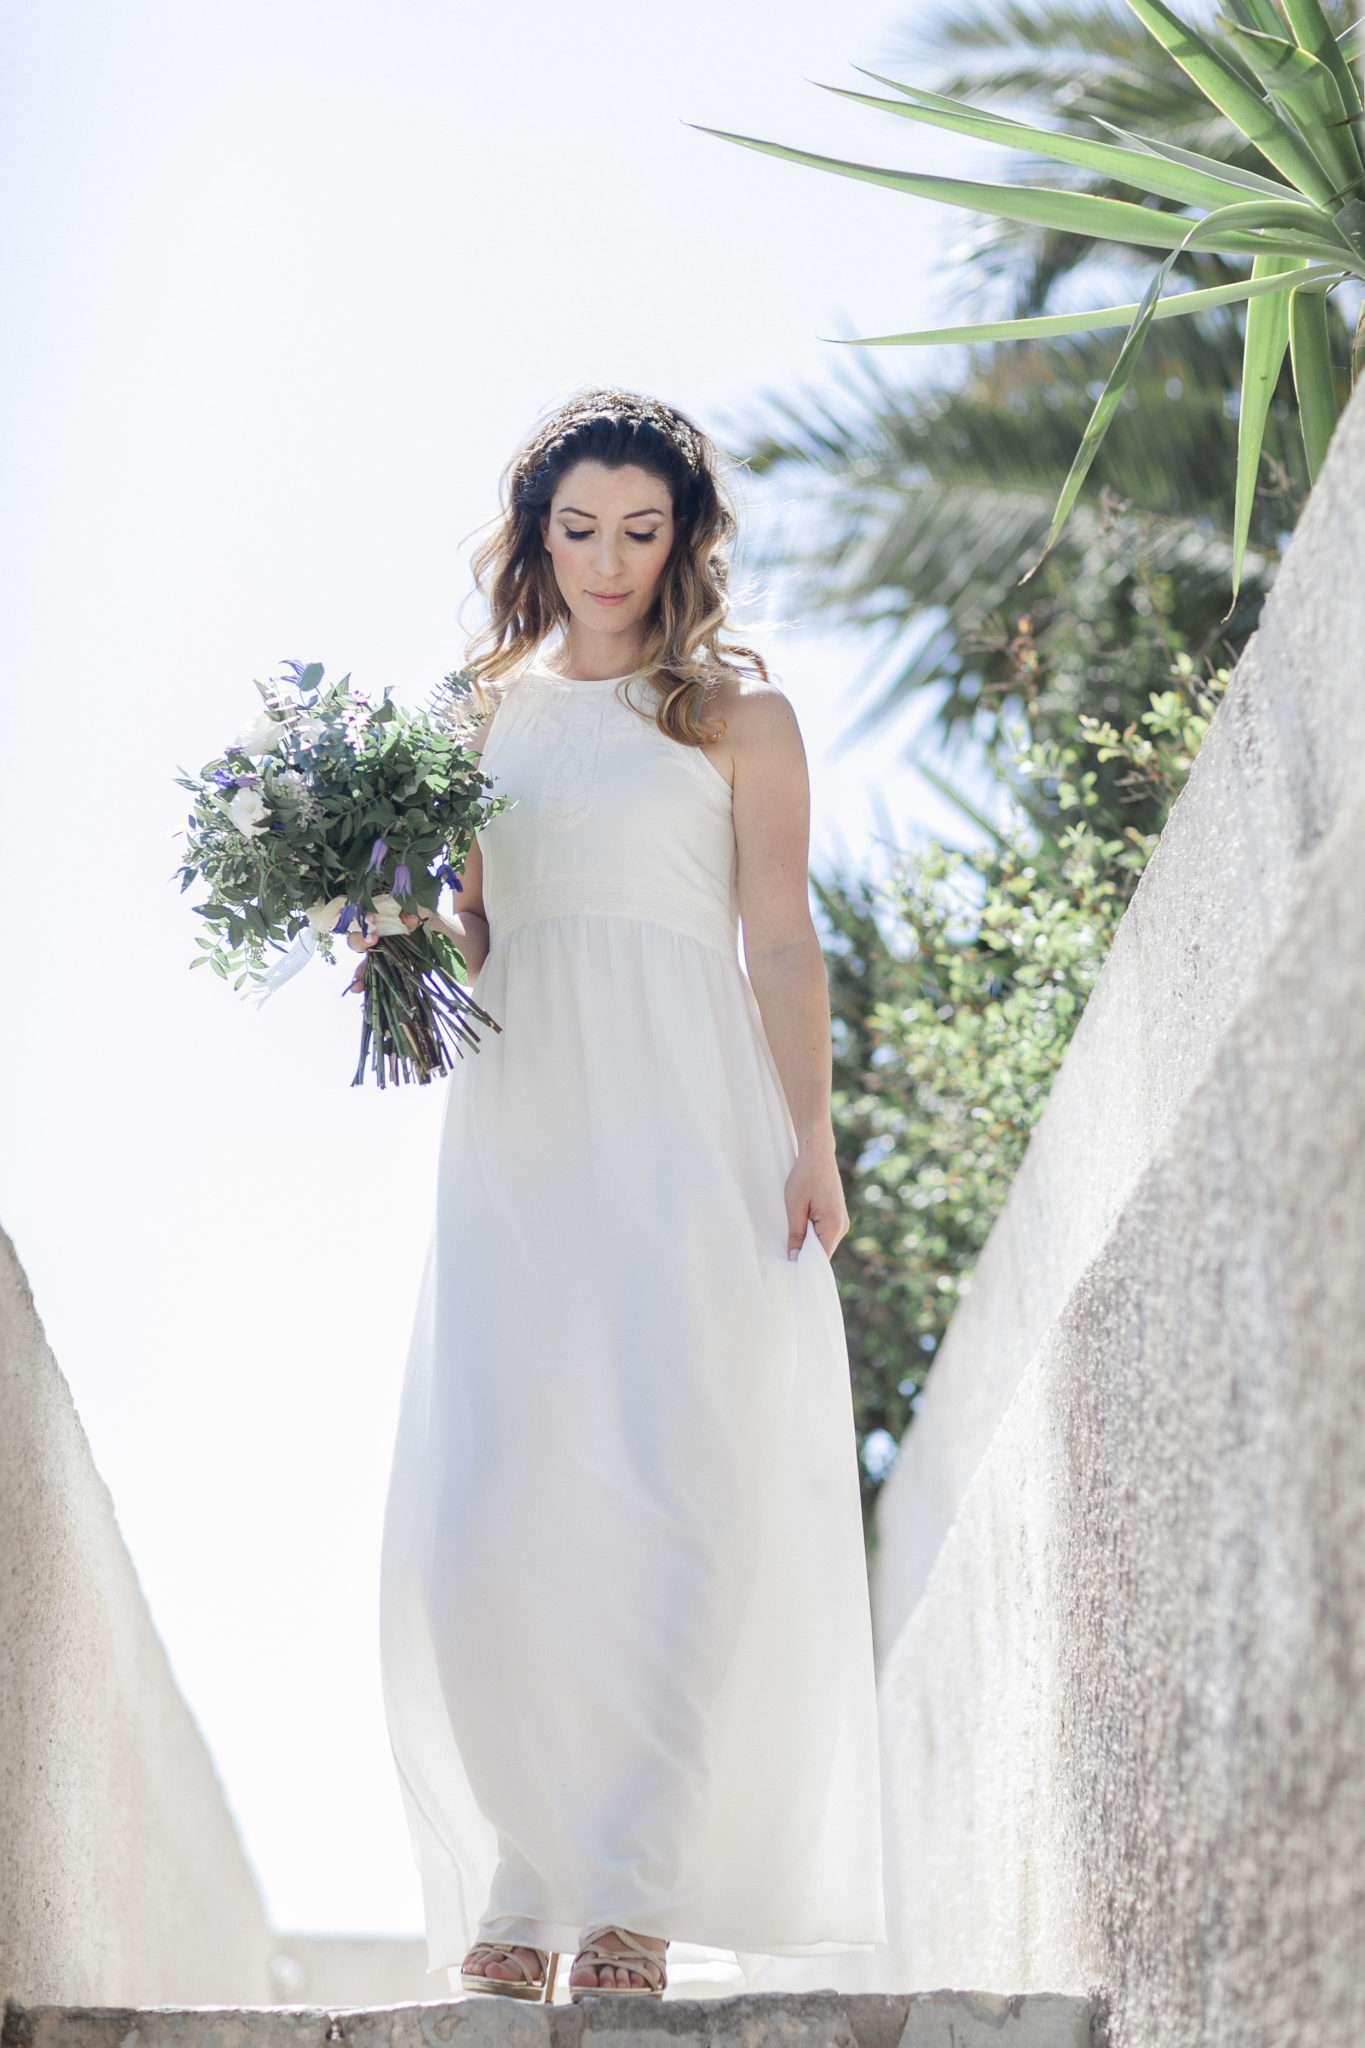 bride with bridal bouquet, white wedding dress, simple wedding dress, minimalist wedding